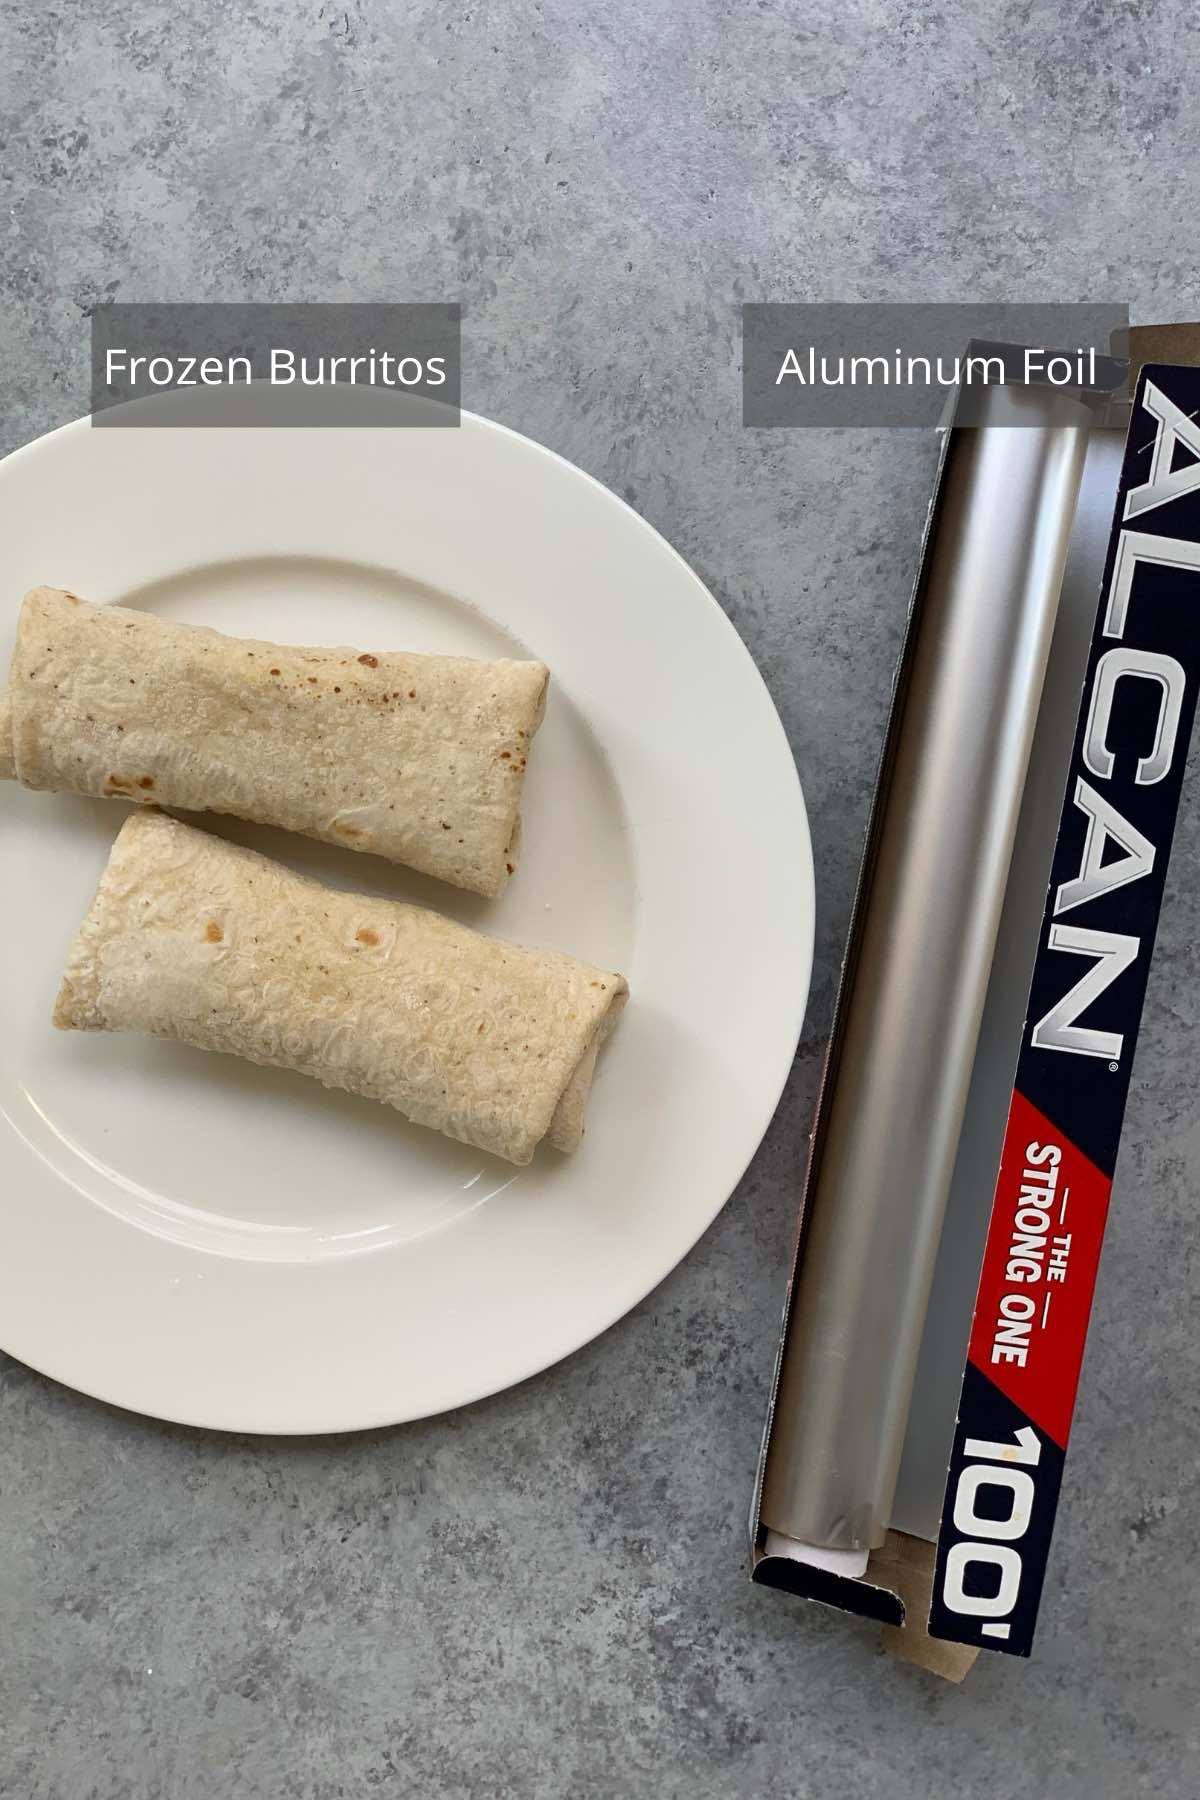 Air Fryer Frozen Burritos ingredients on the counter.